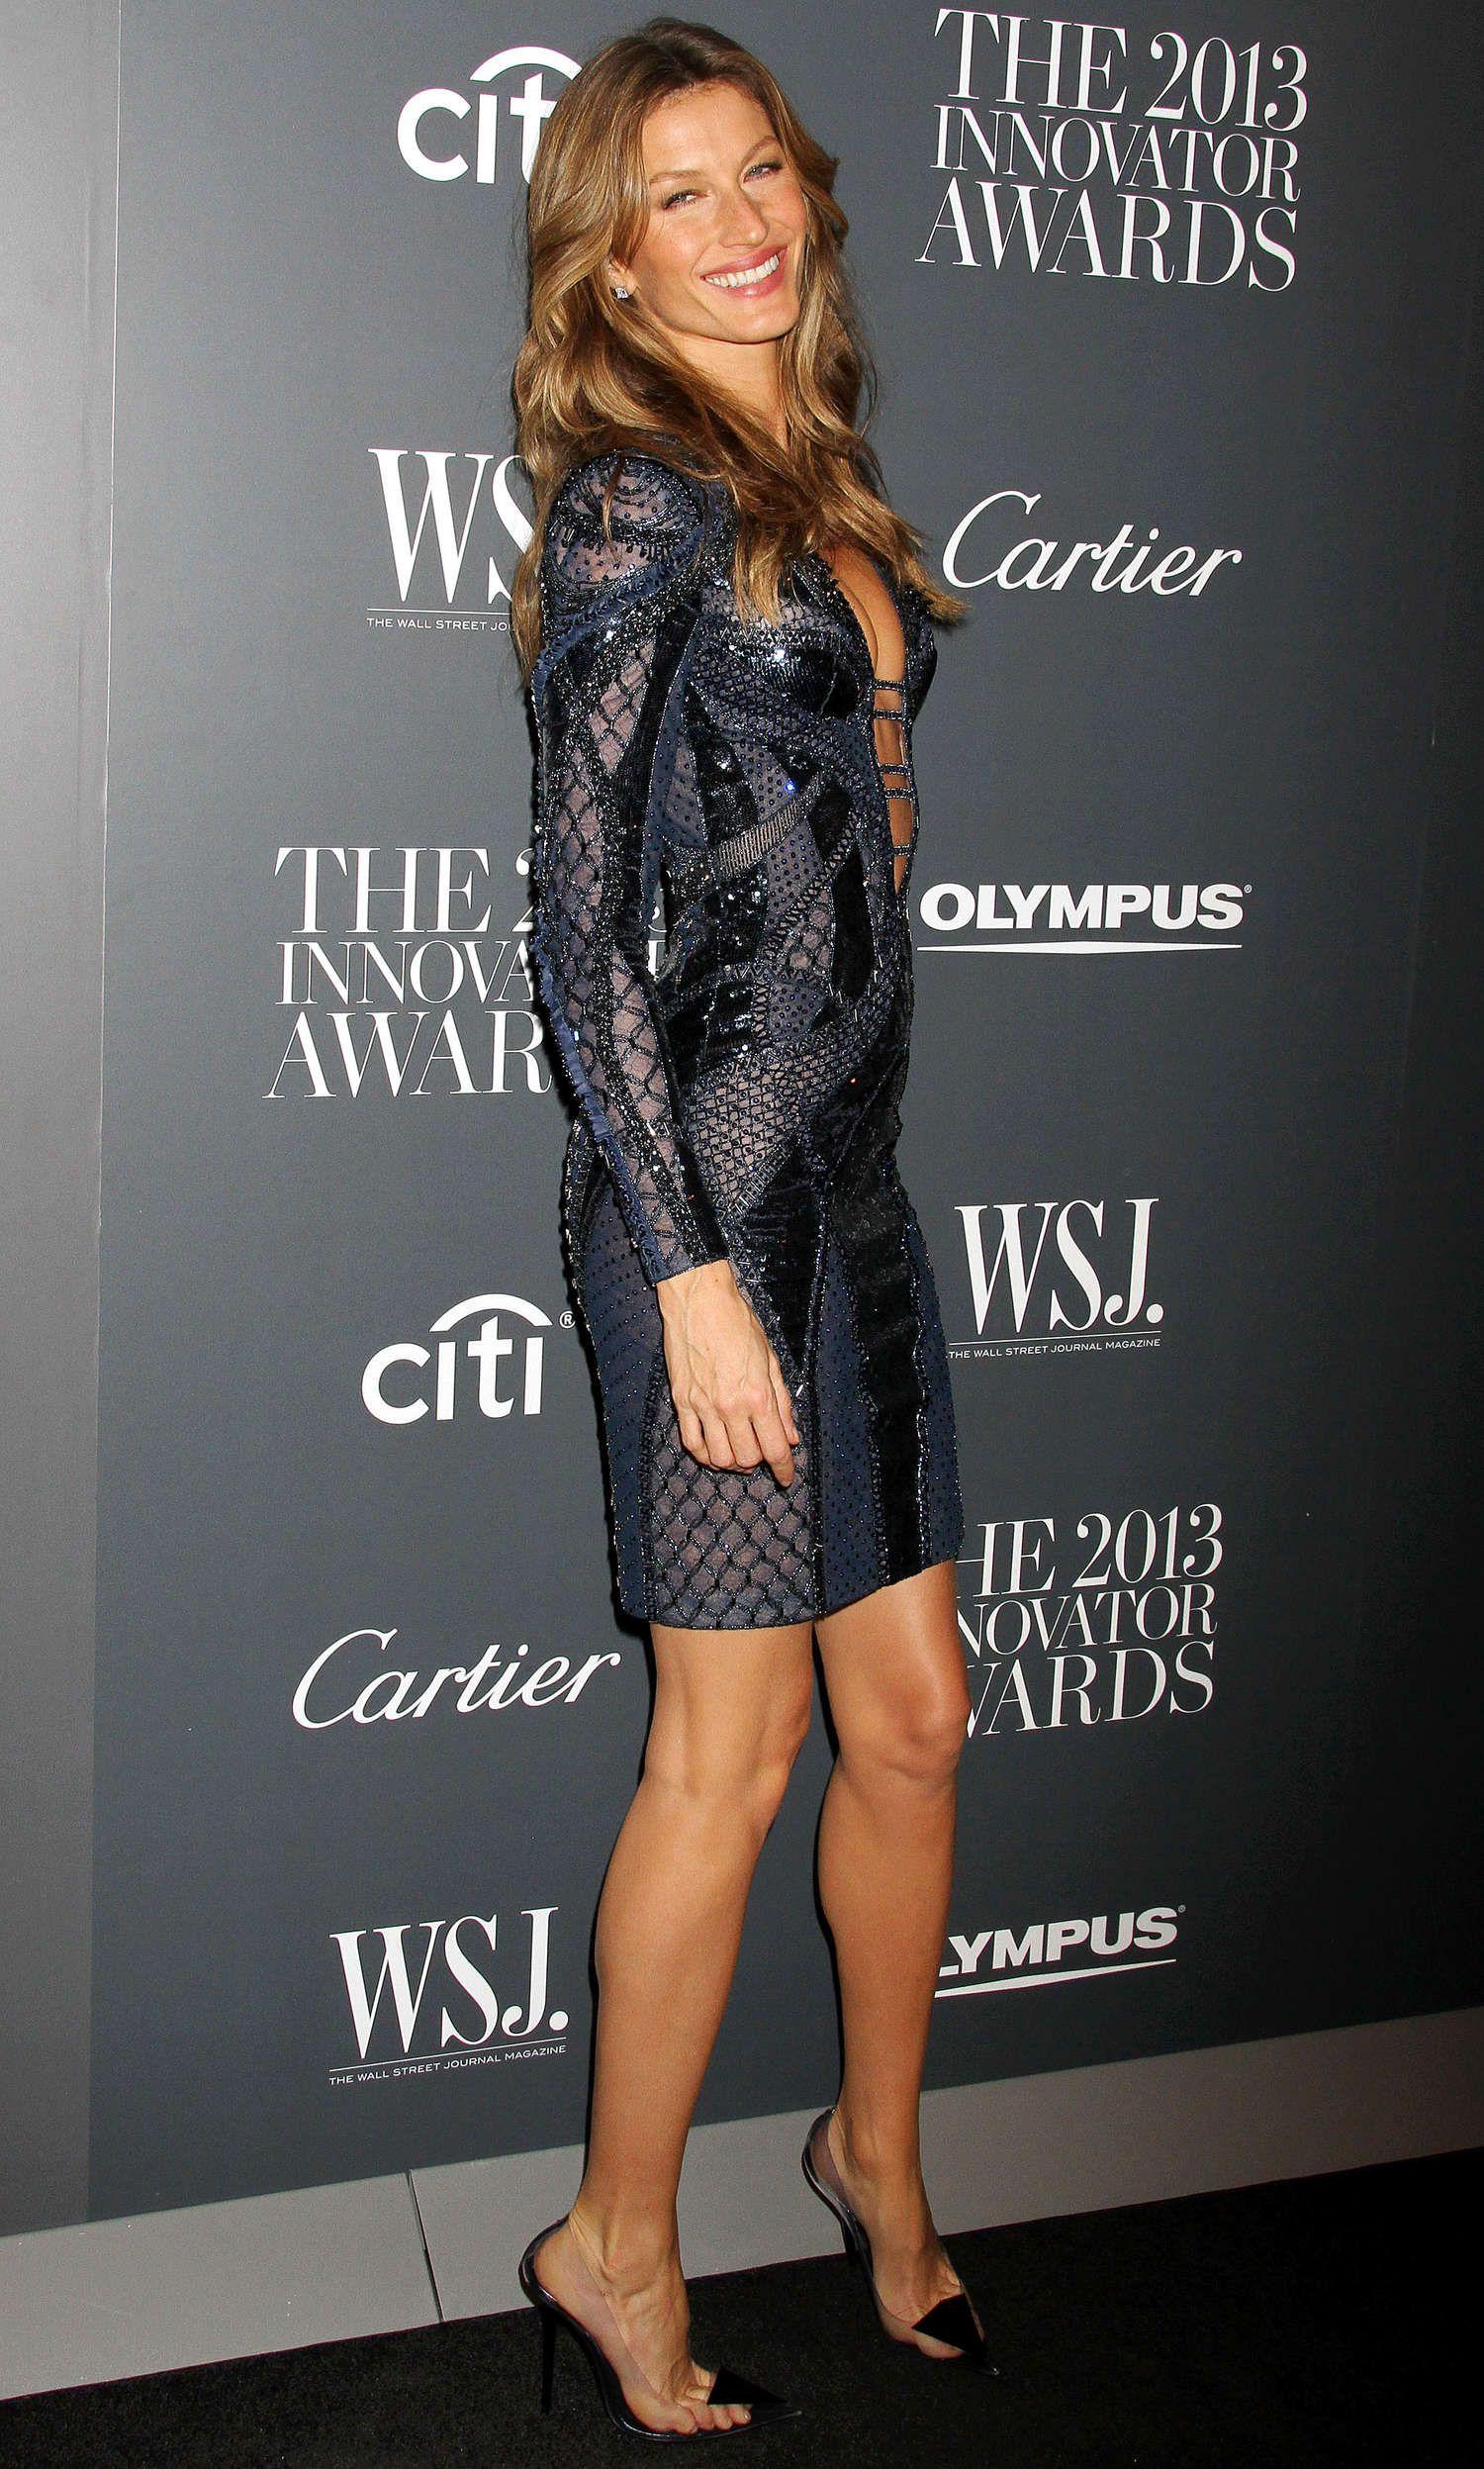 Gisele Bundchen best red carpet - Zntent.com | Celebrity Photo, Video & Award info